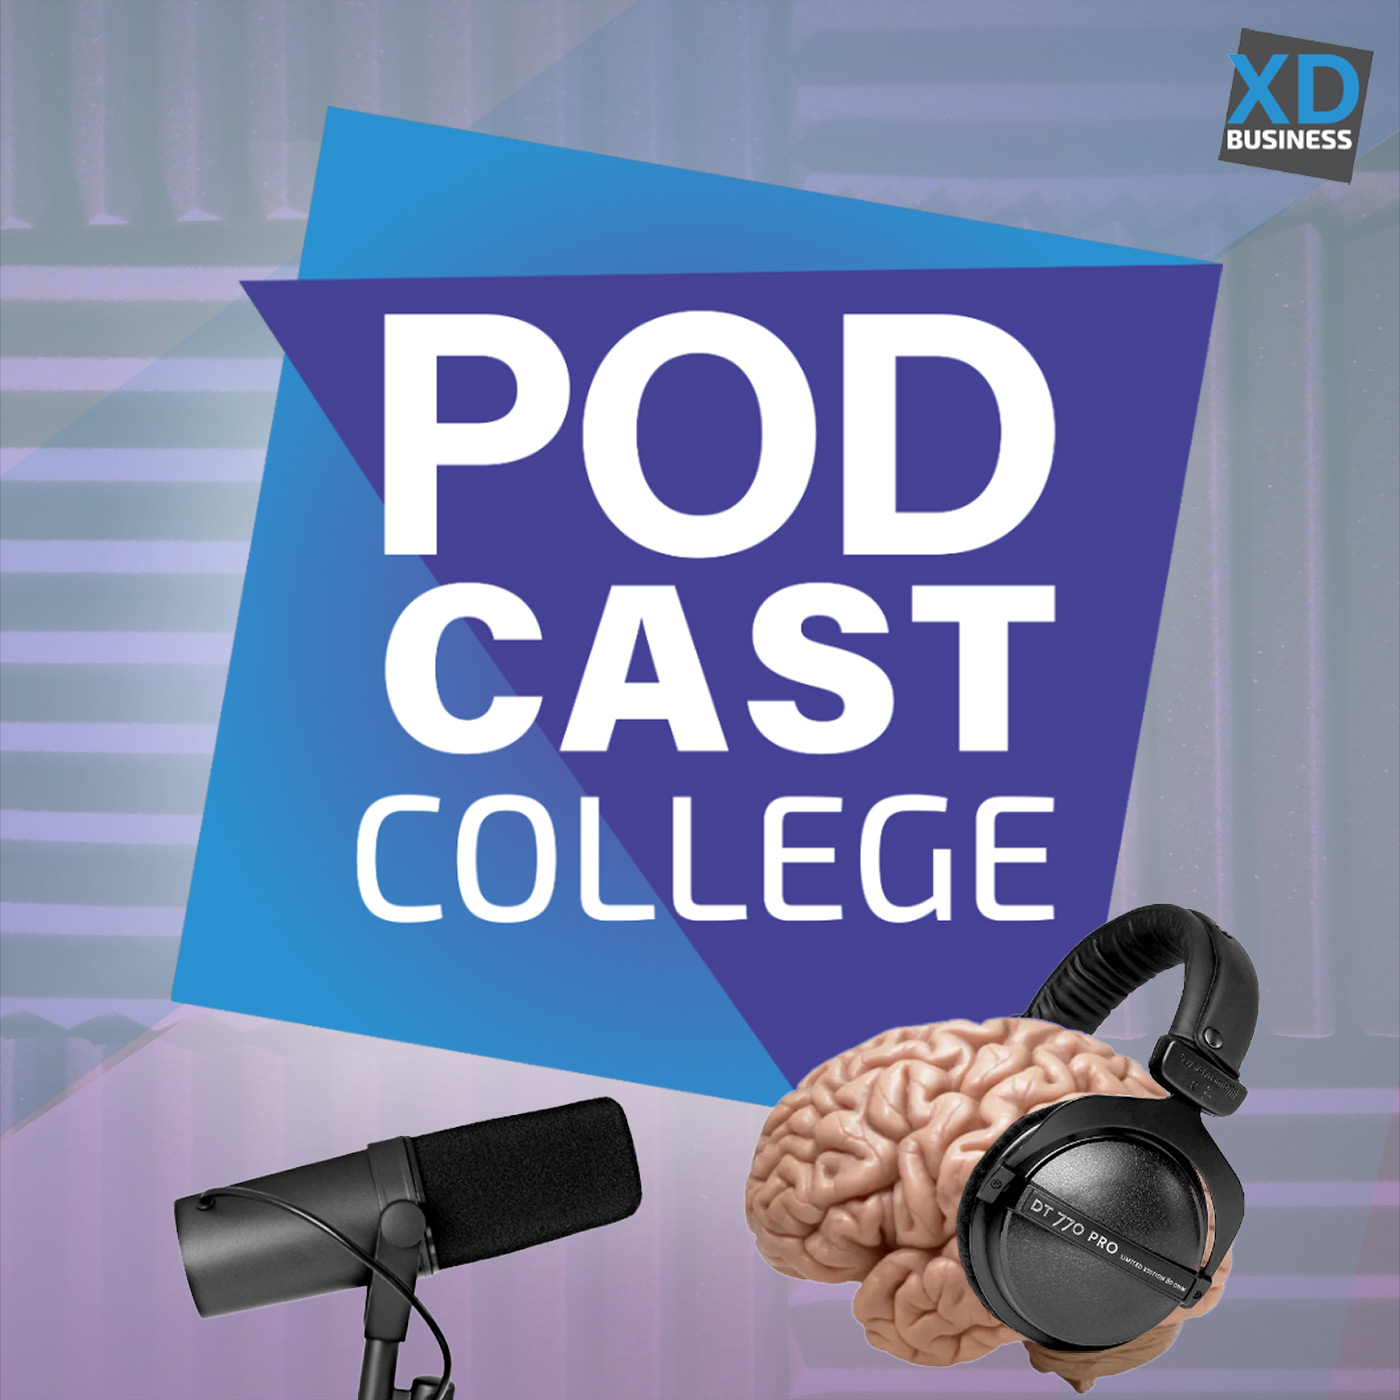 Podcast College